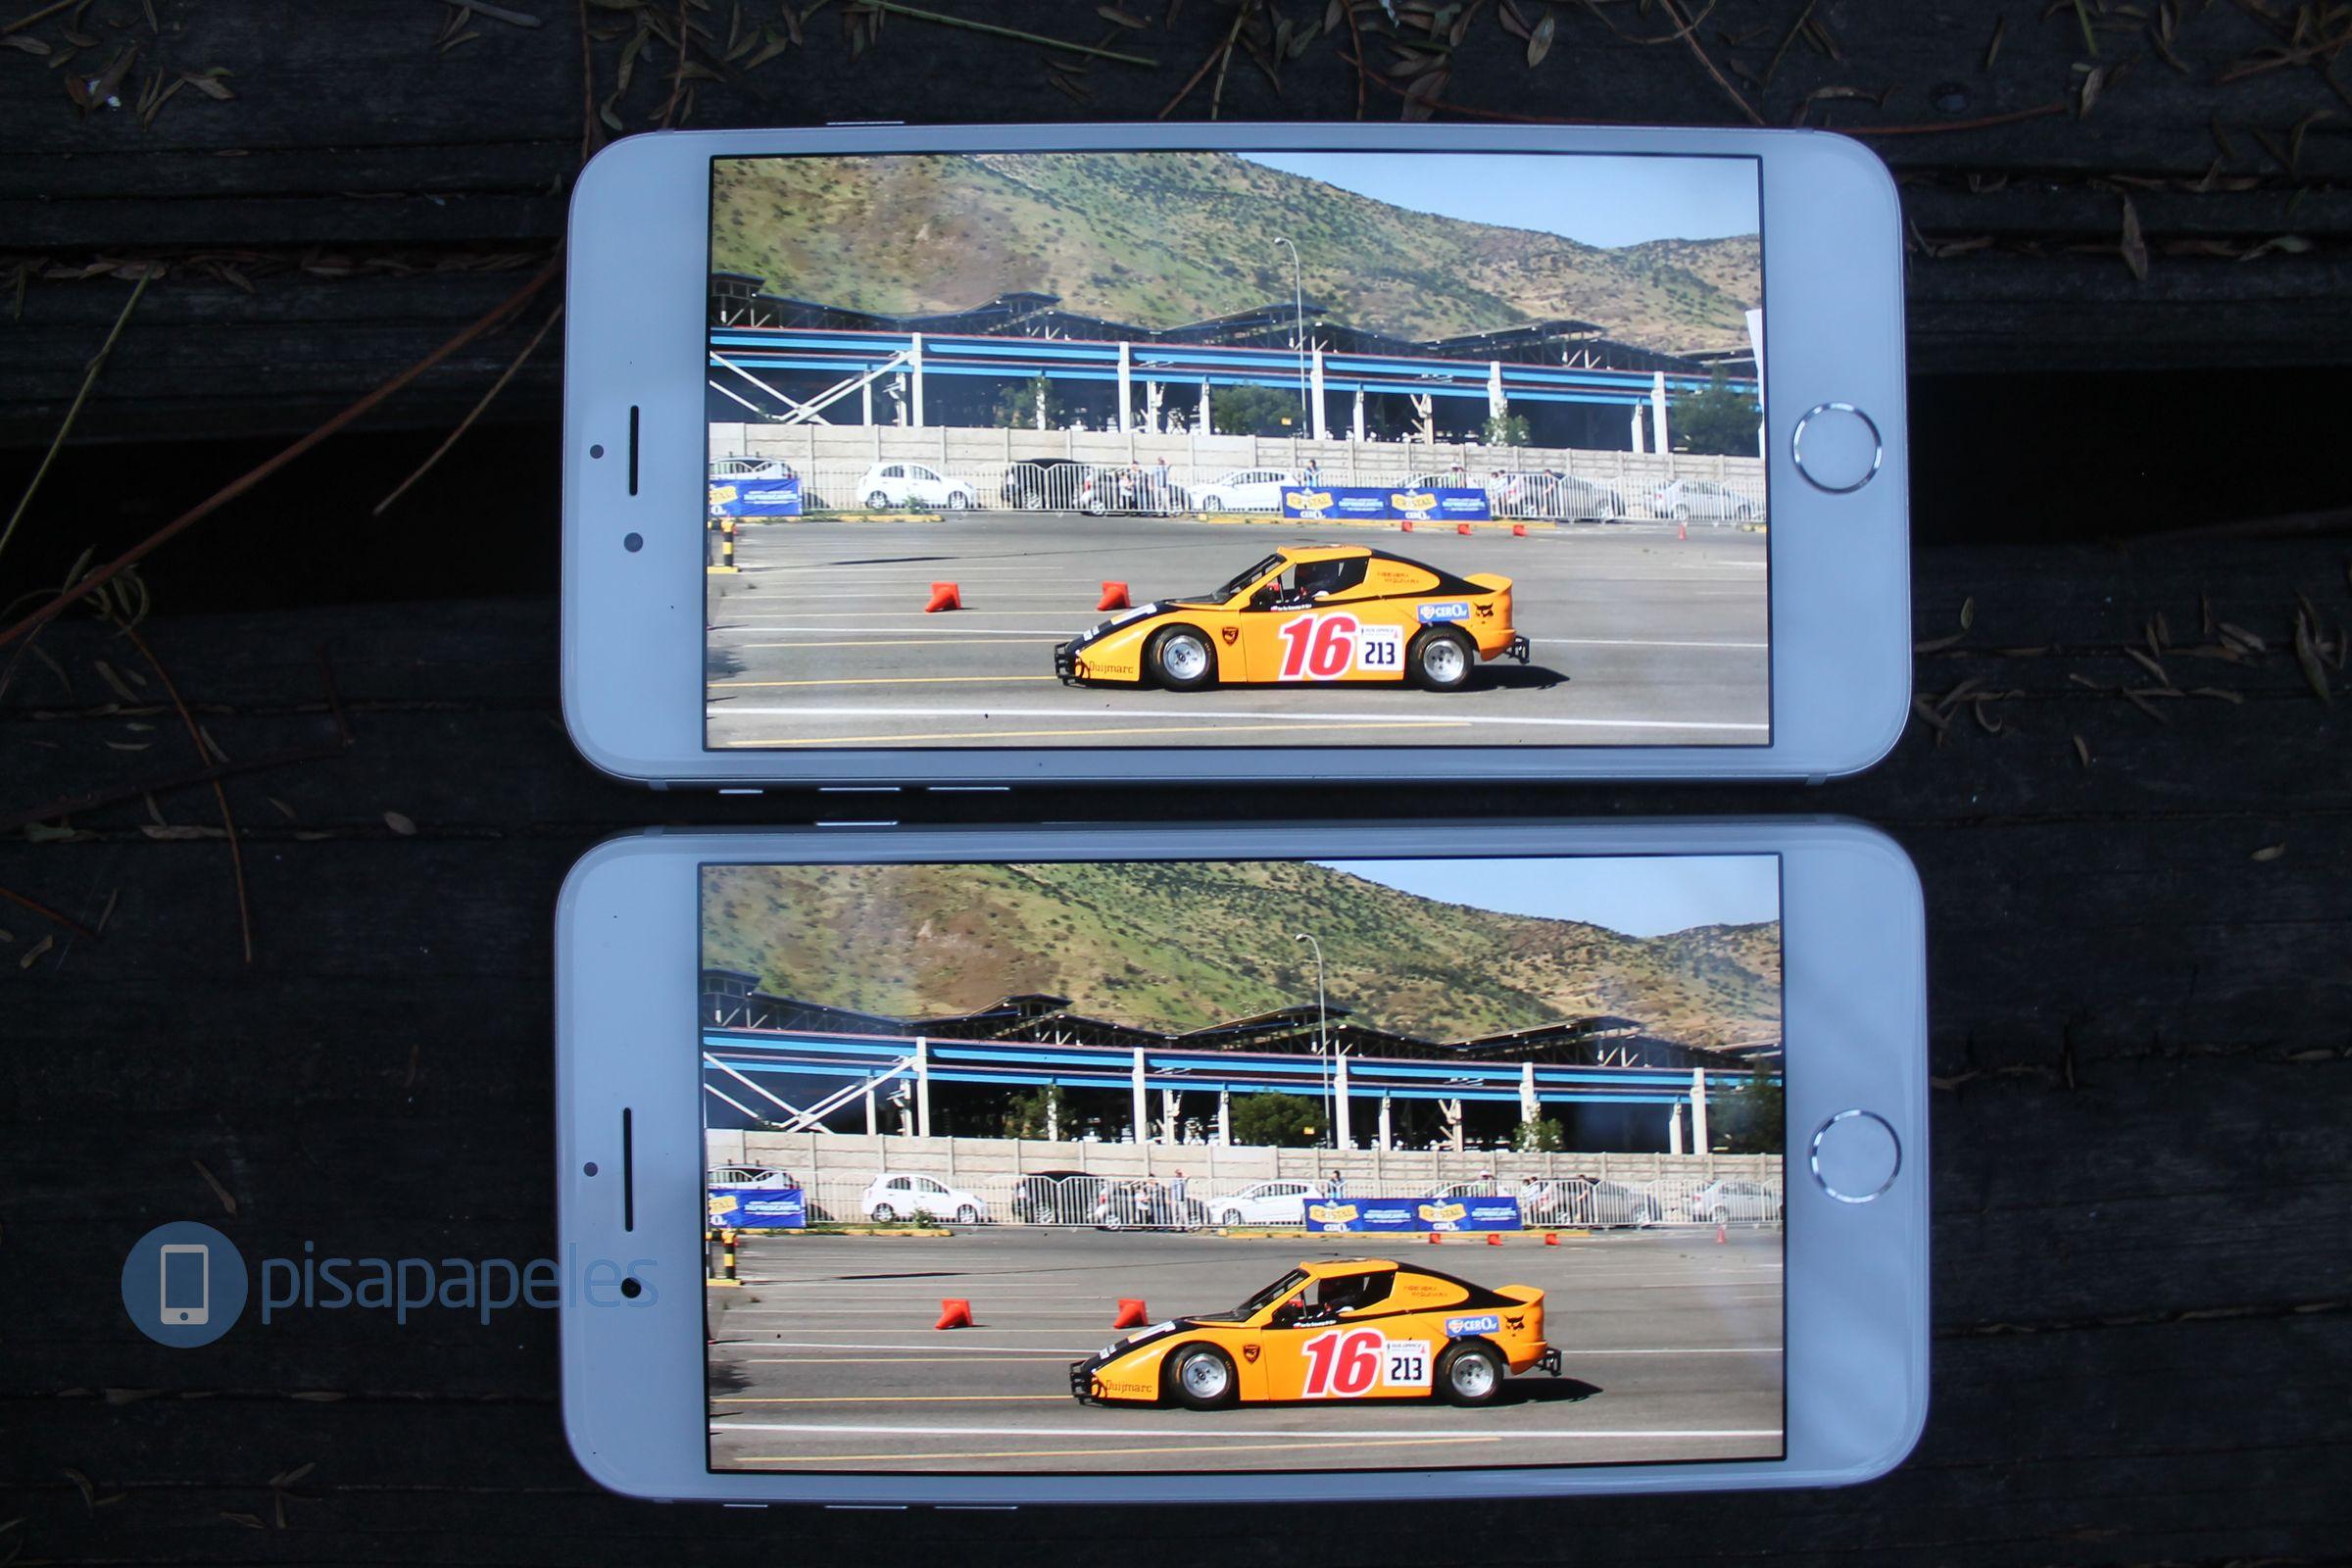 iPhone 6s Plus arriba, iPhone 7 Plus abajo.